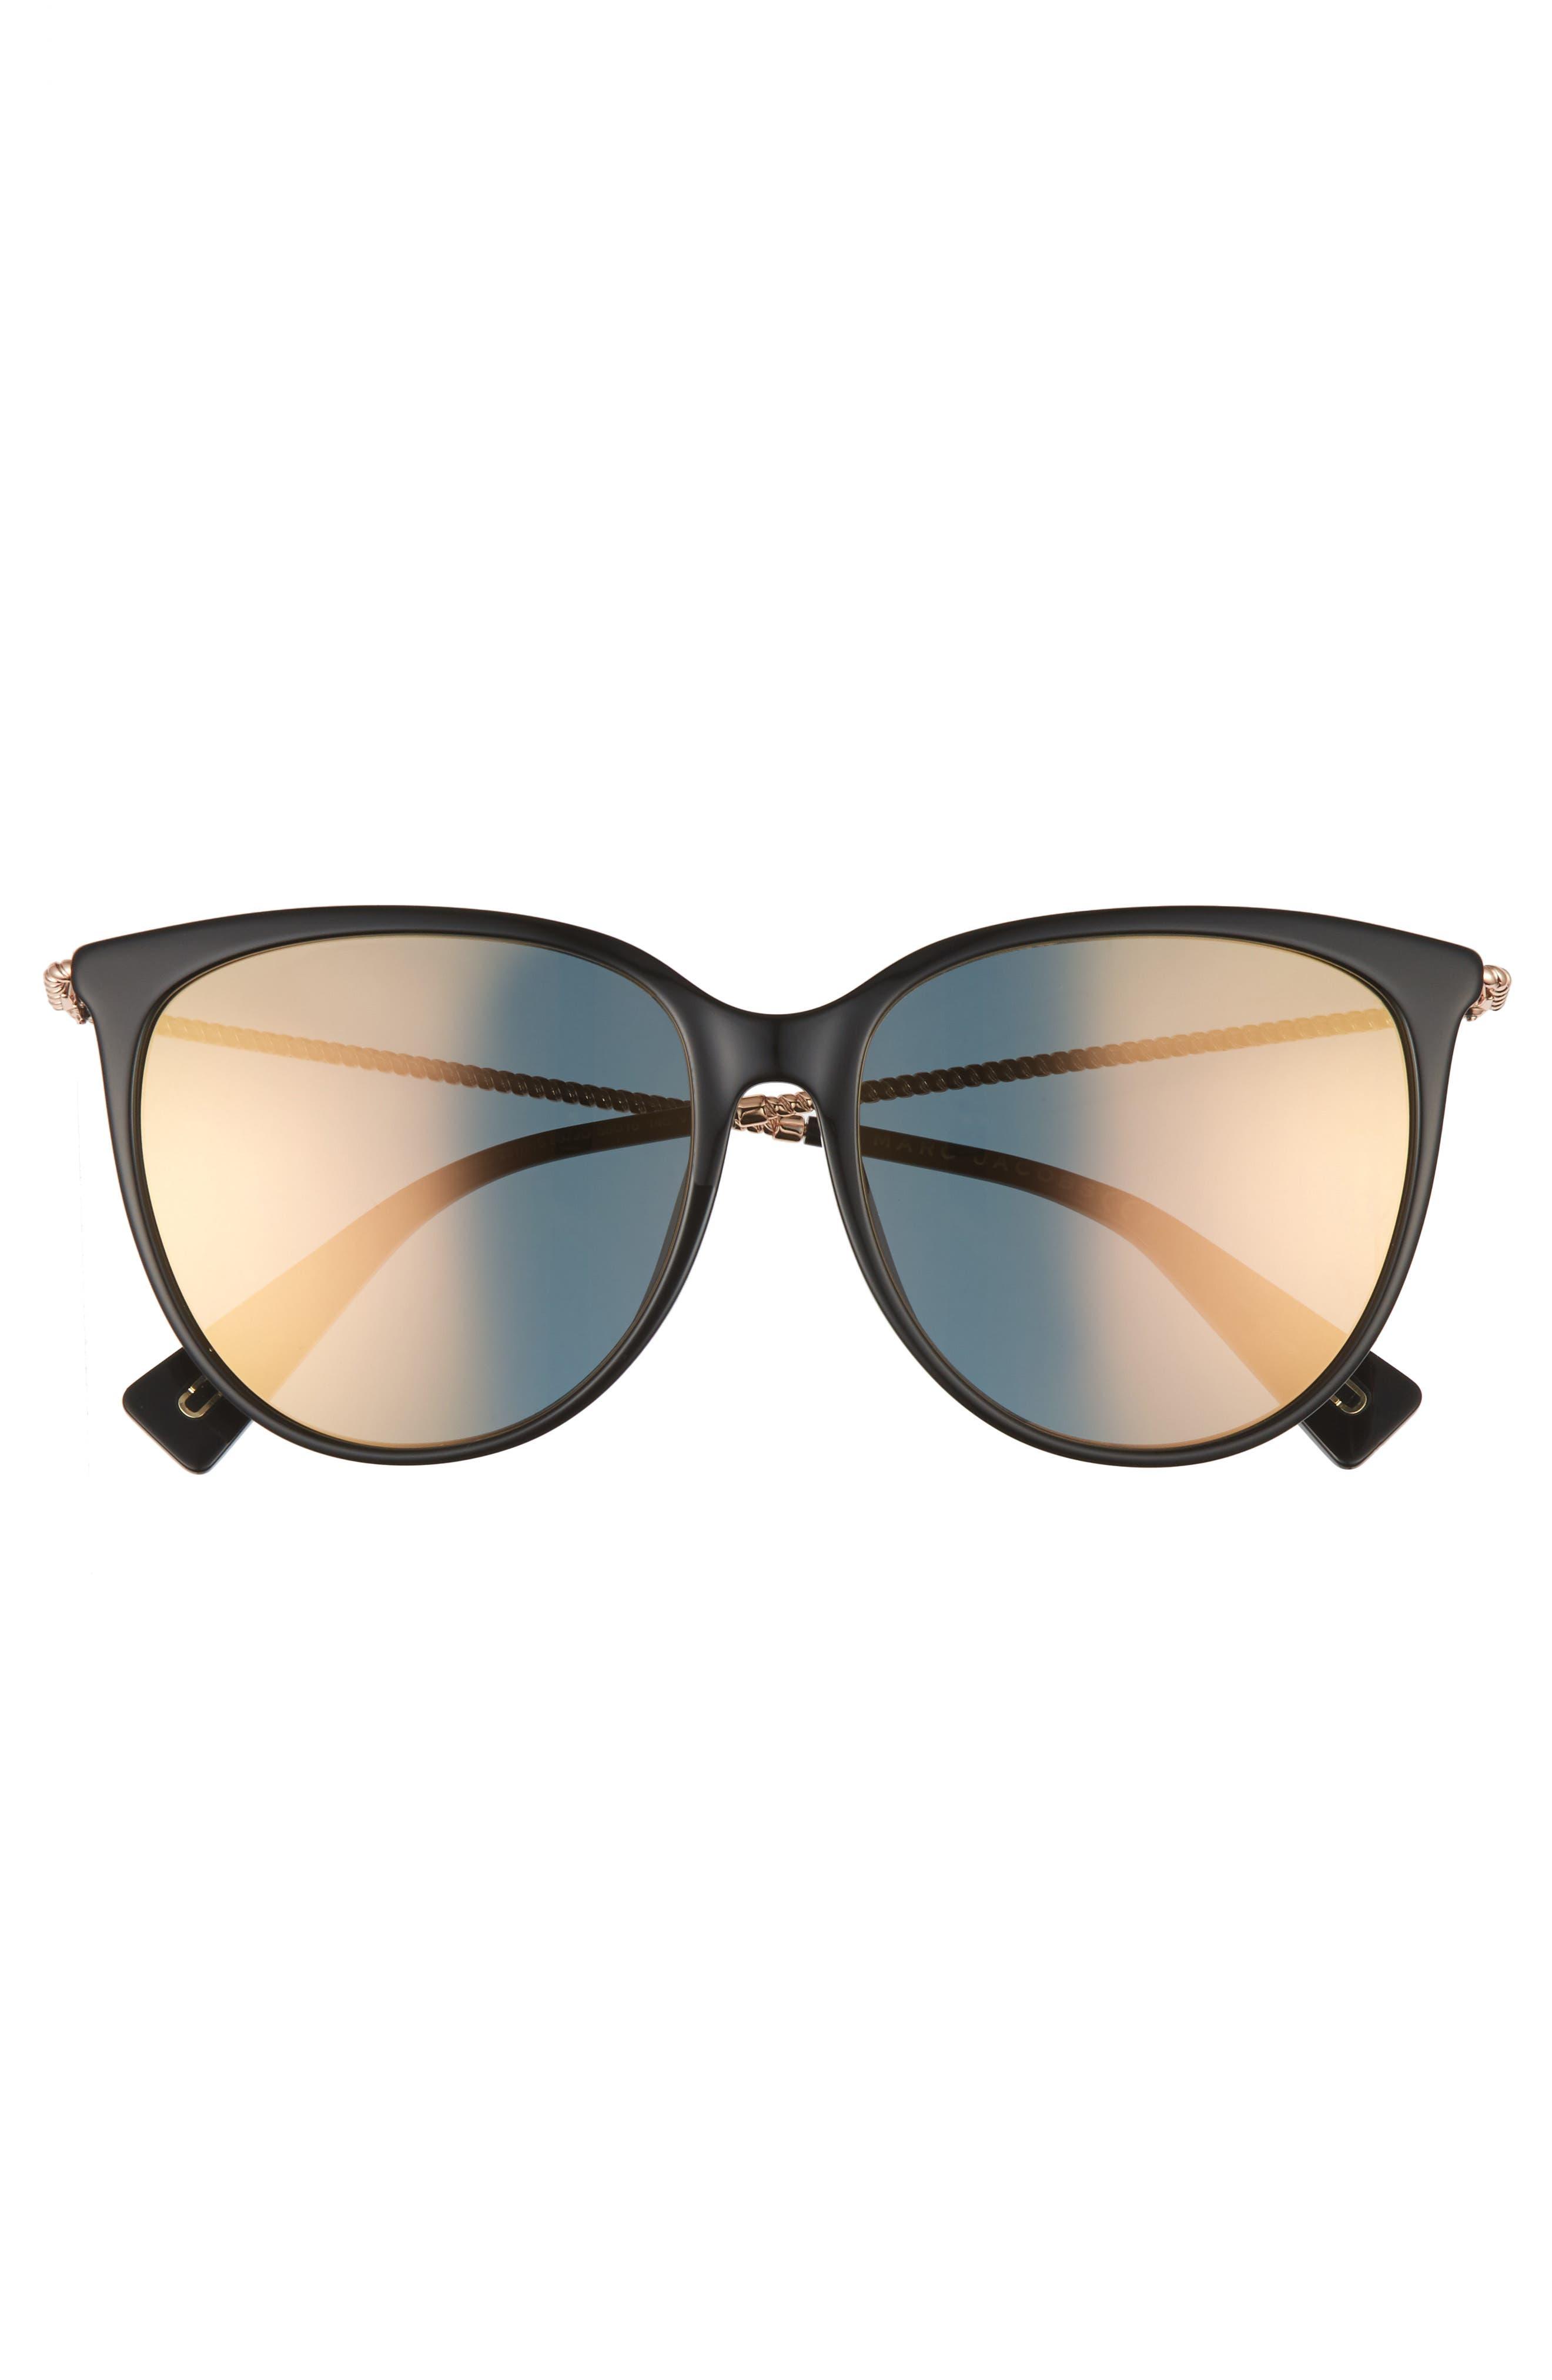 MARC JACOBS,                             56mm Cat Eye Sunglasses,                             Alternate thumbnail 3, color,                             001